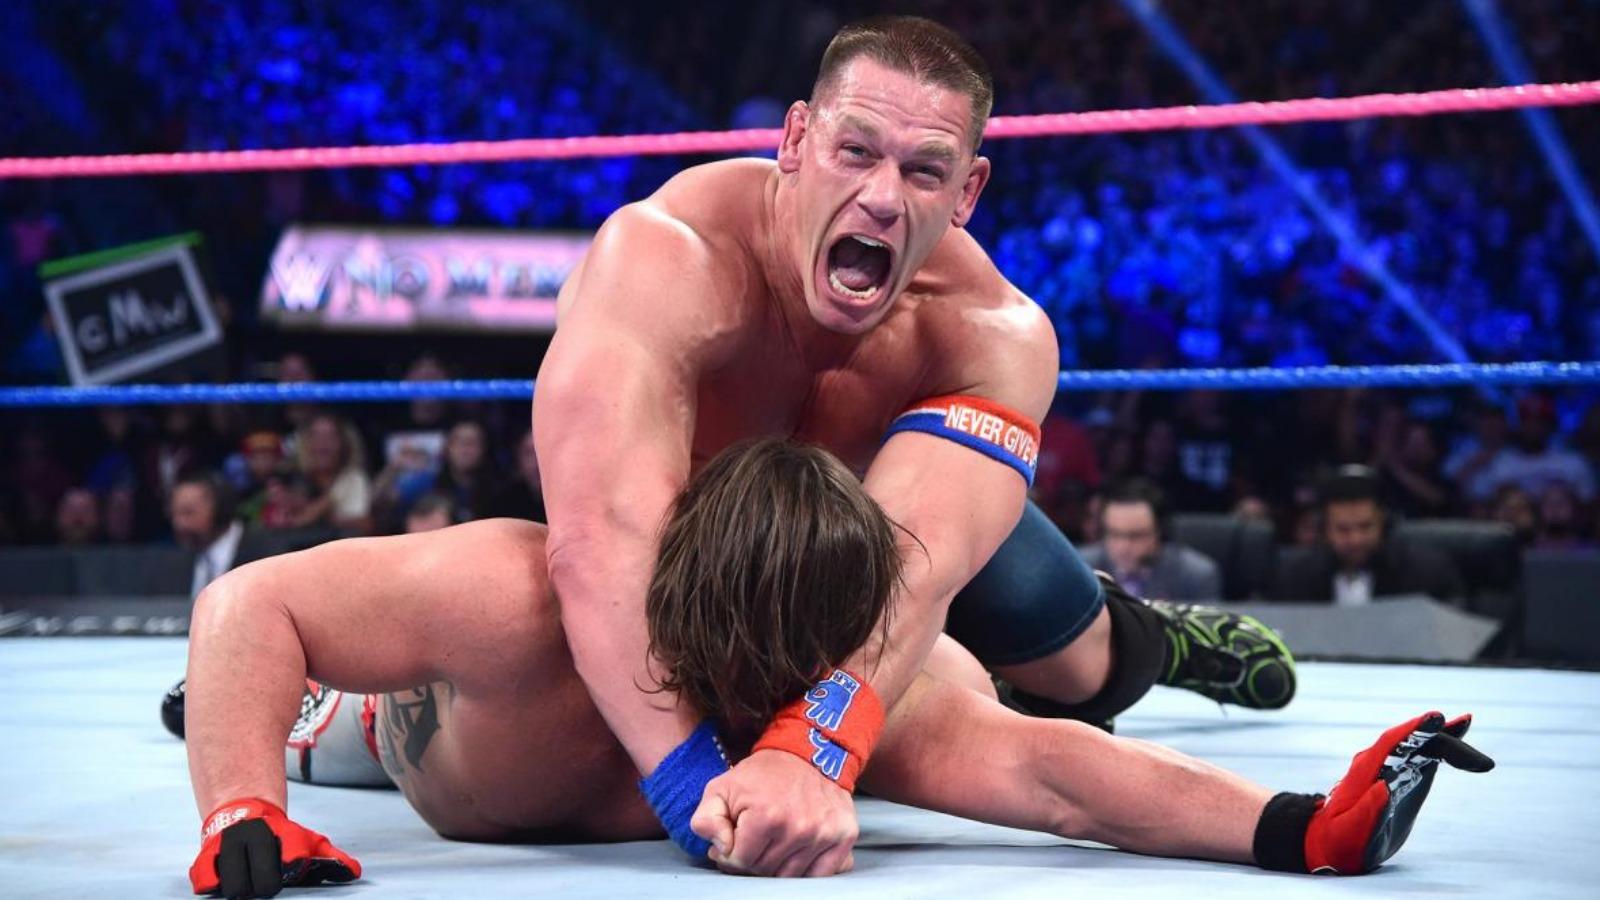 AJ Styles will main event WrestleMania 33 against Bray Wyatt | FOX Sports